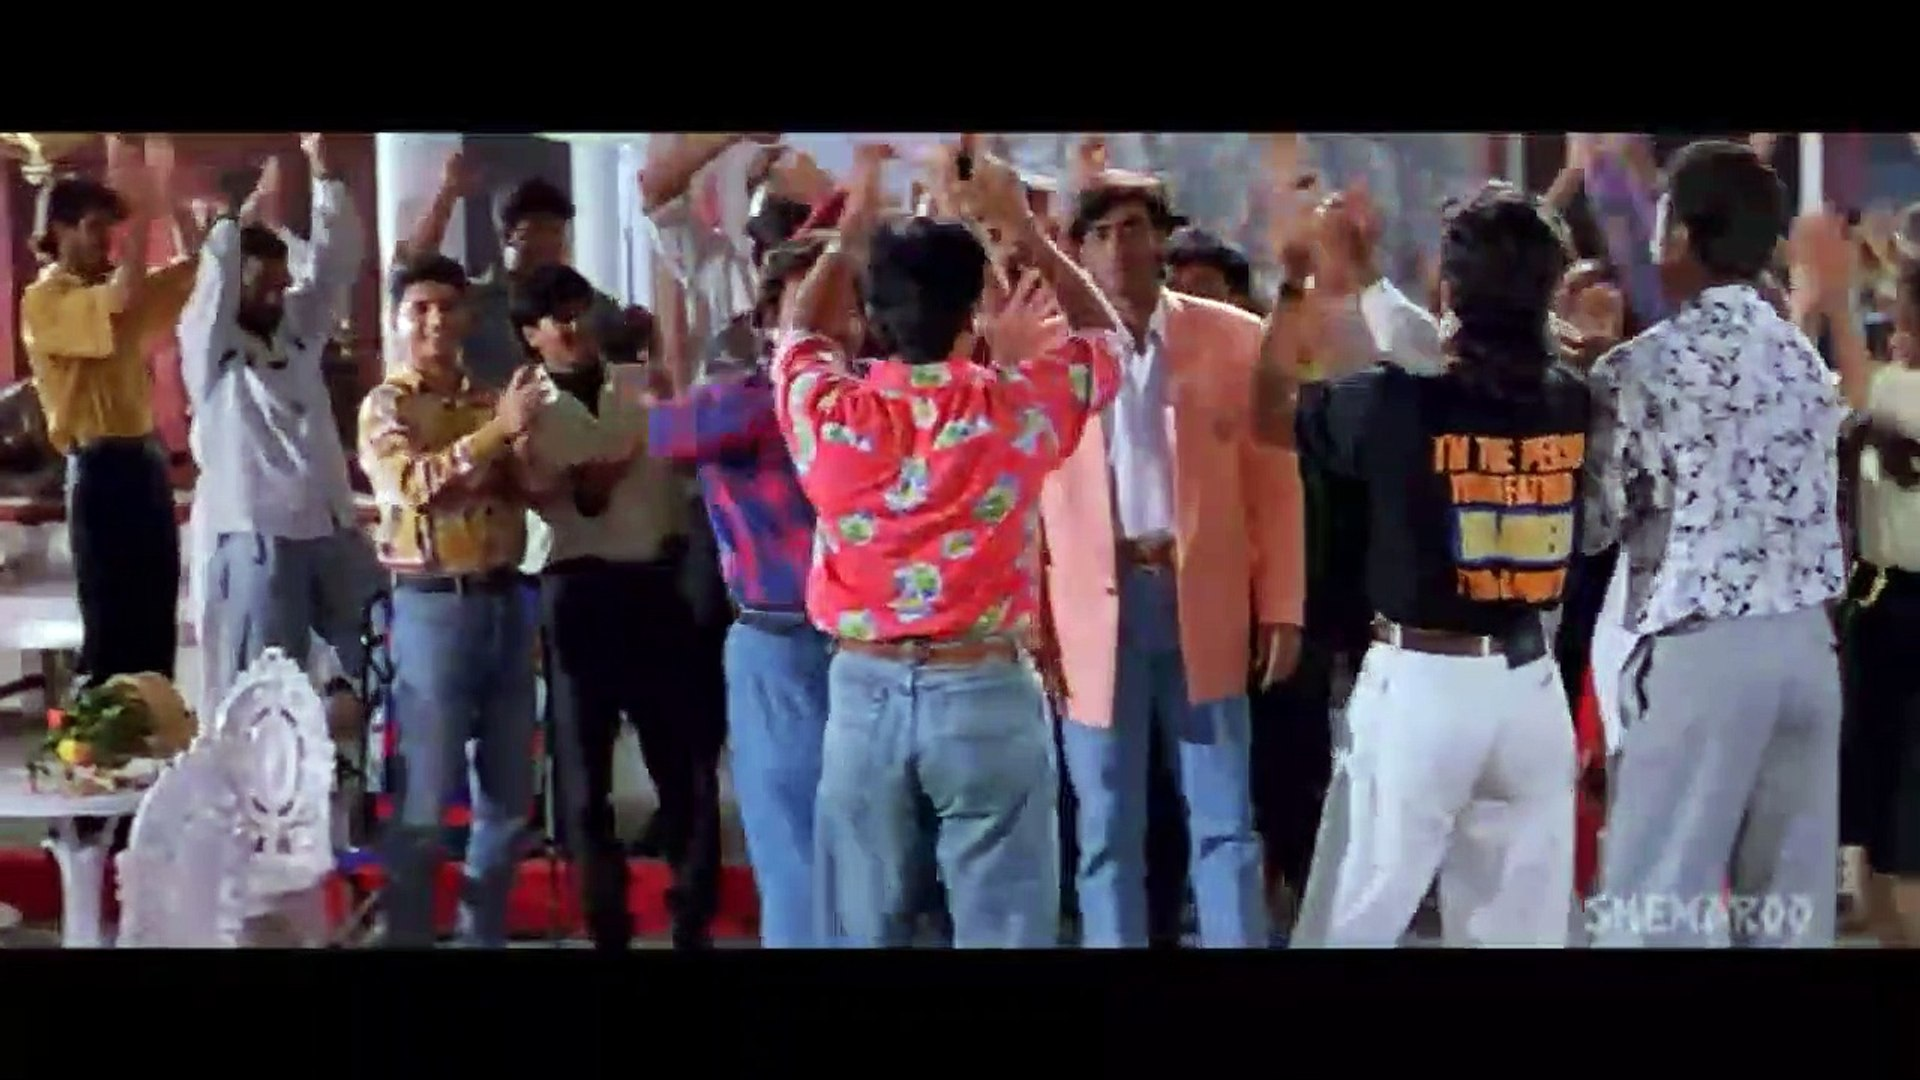 ajay devgan funny  dubbing movie | dilwale Movie Dialogue Video | bollywood funny dubbing version mo